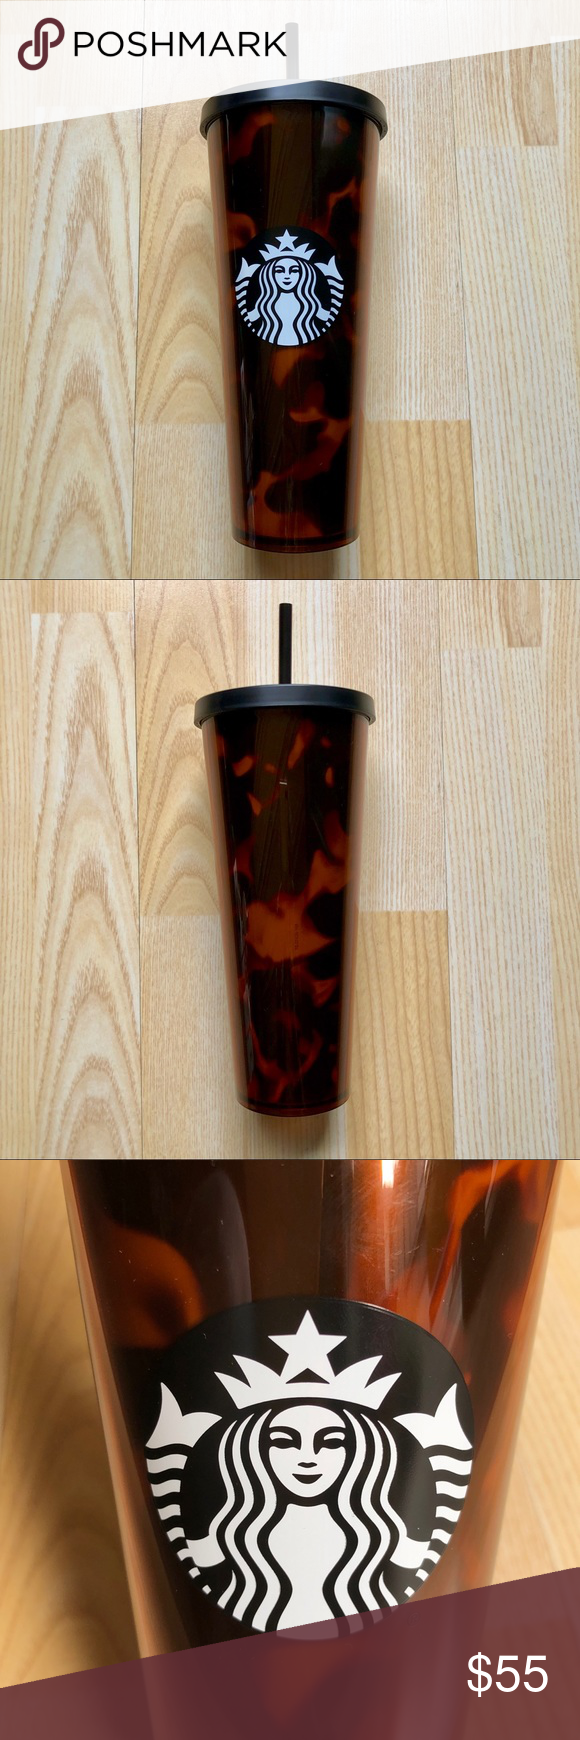 Starbucks 2019 Mocha Swirl Acrylic Cold Cup Tumbler Venti size 24 oz